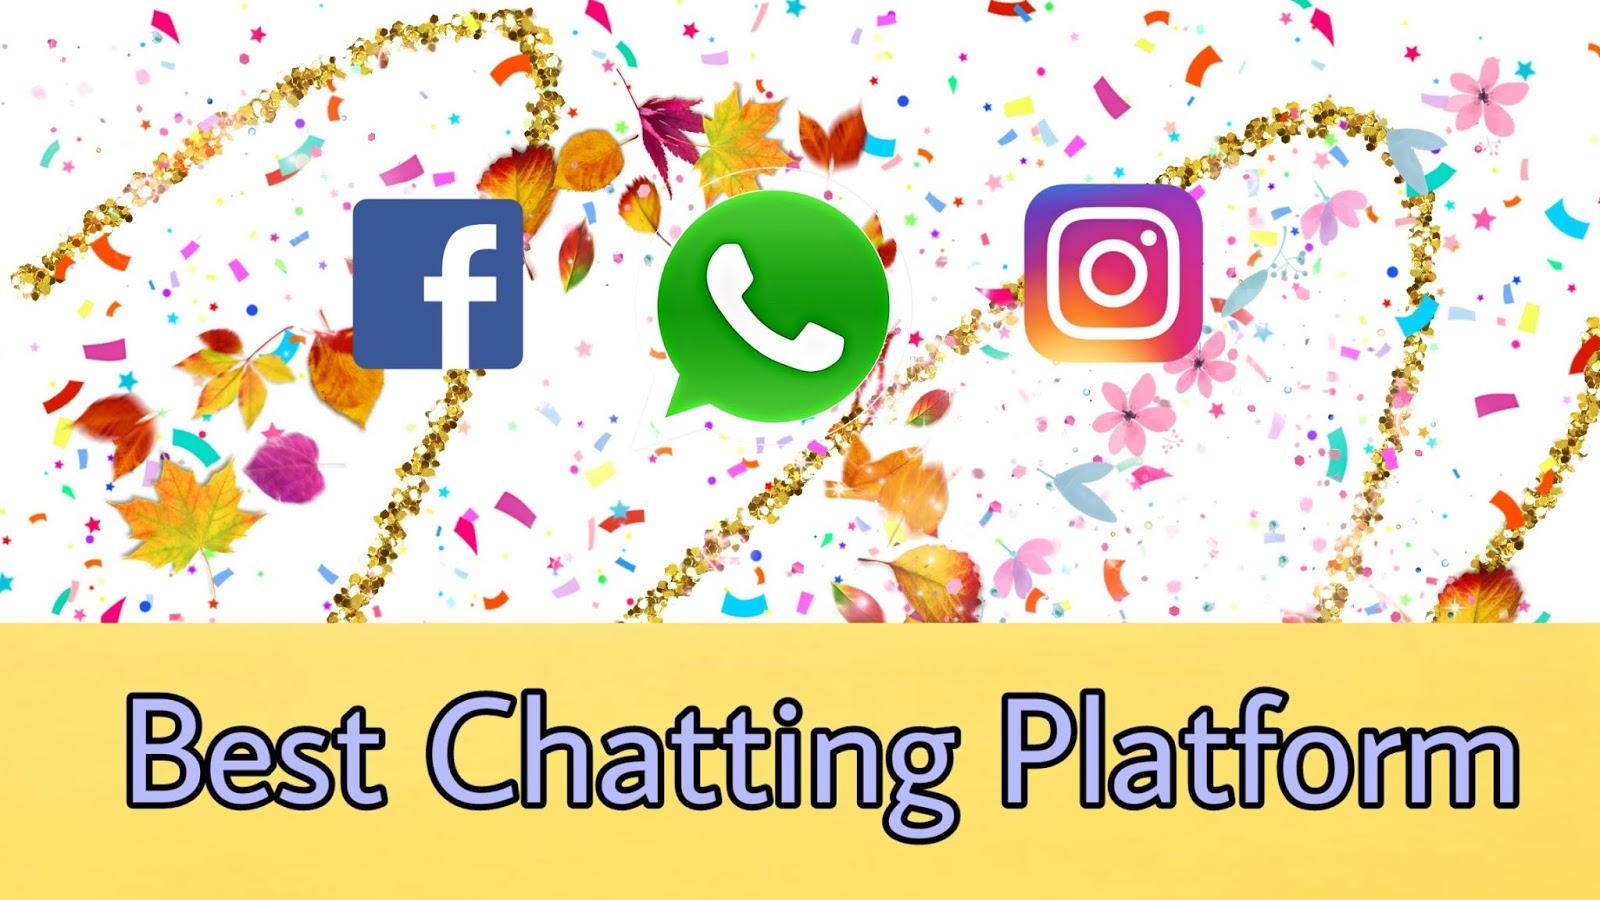 Best chatting platform to Impress a Girl